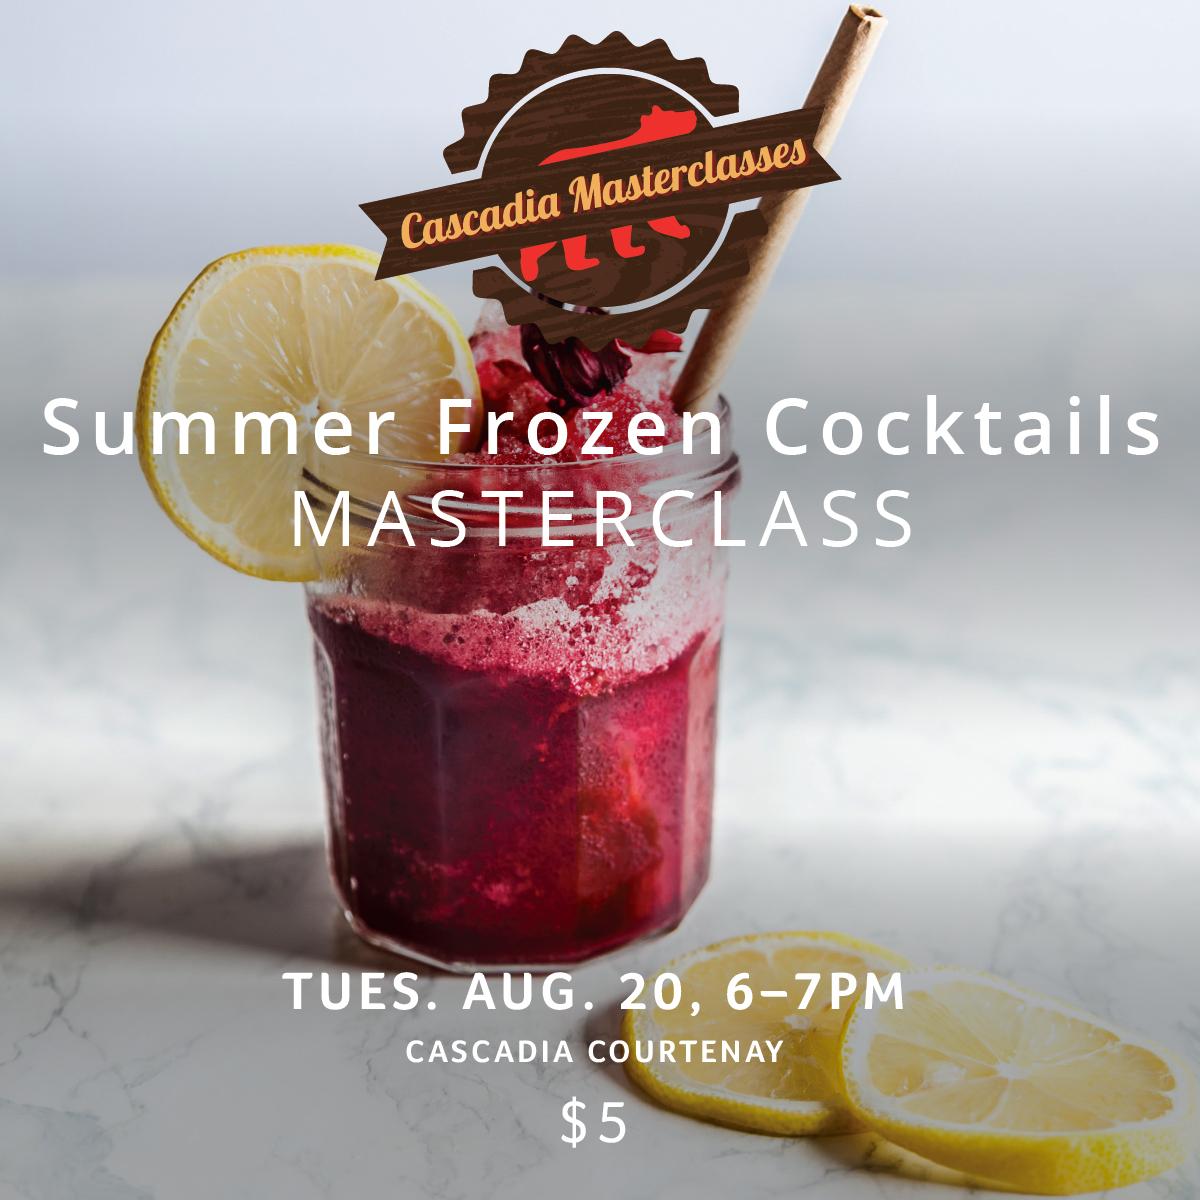 Cascadia Courtenay Masterclass_SummerCocktails_August 2019_Web.jpg